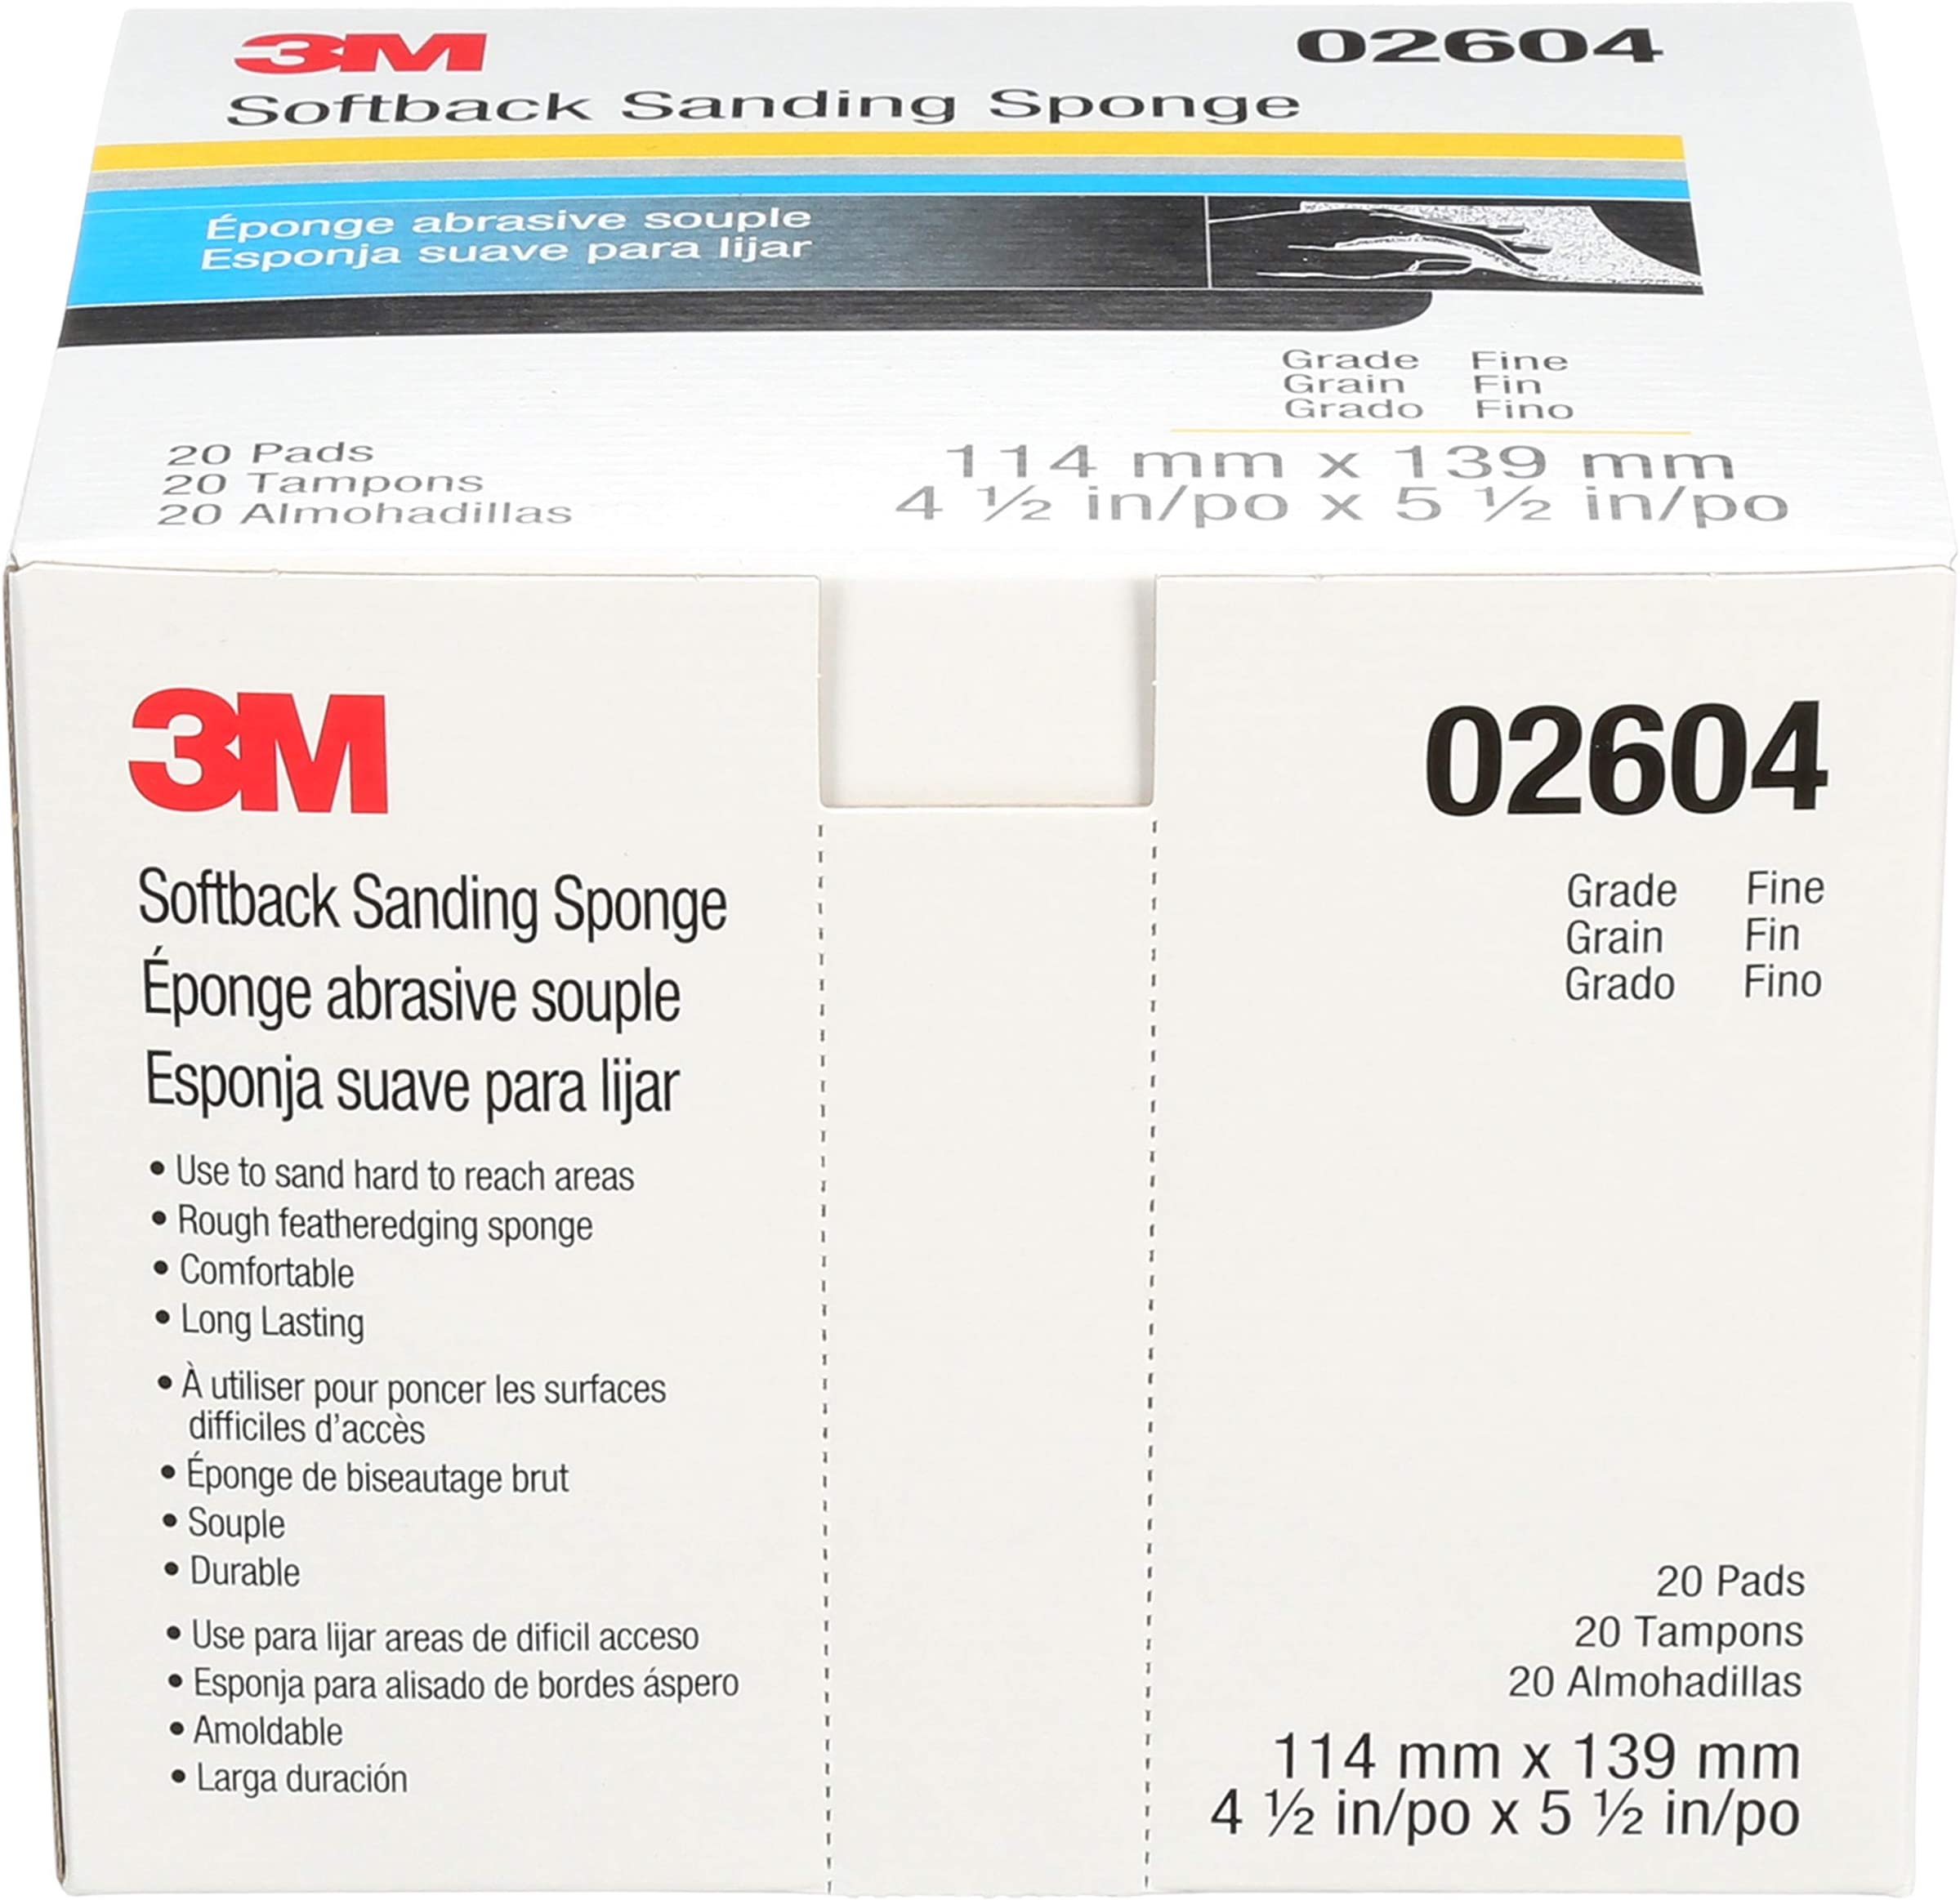 3M Softback Sanding Sponge 02604 20 Pads